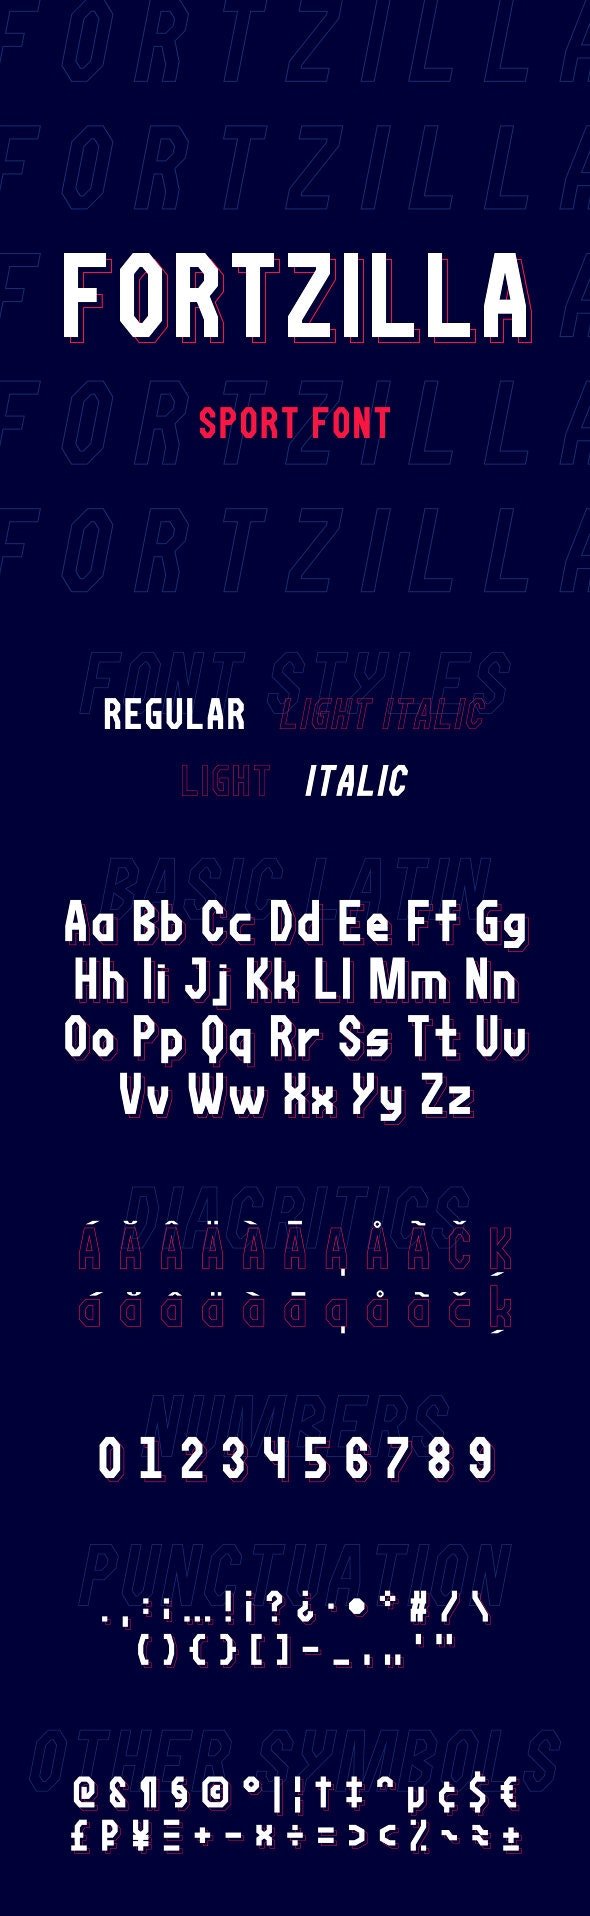 Fortzilla Font - Miscellaneous Sans-Serif